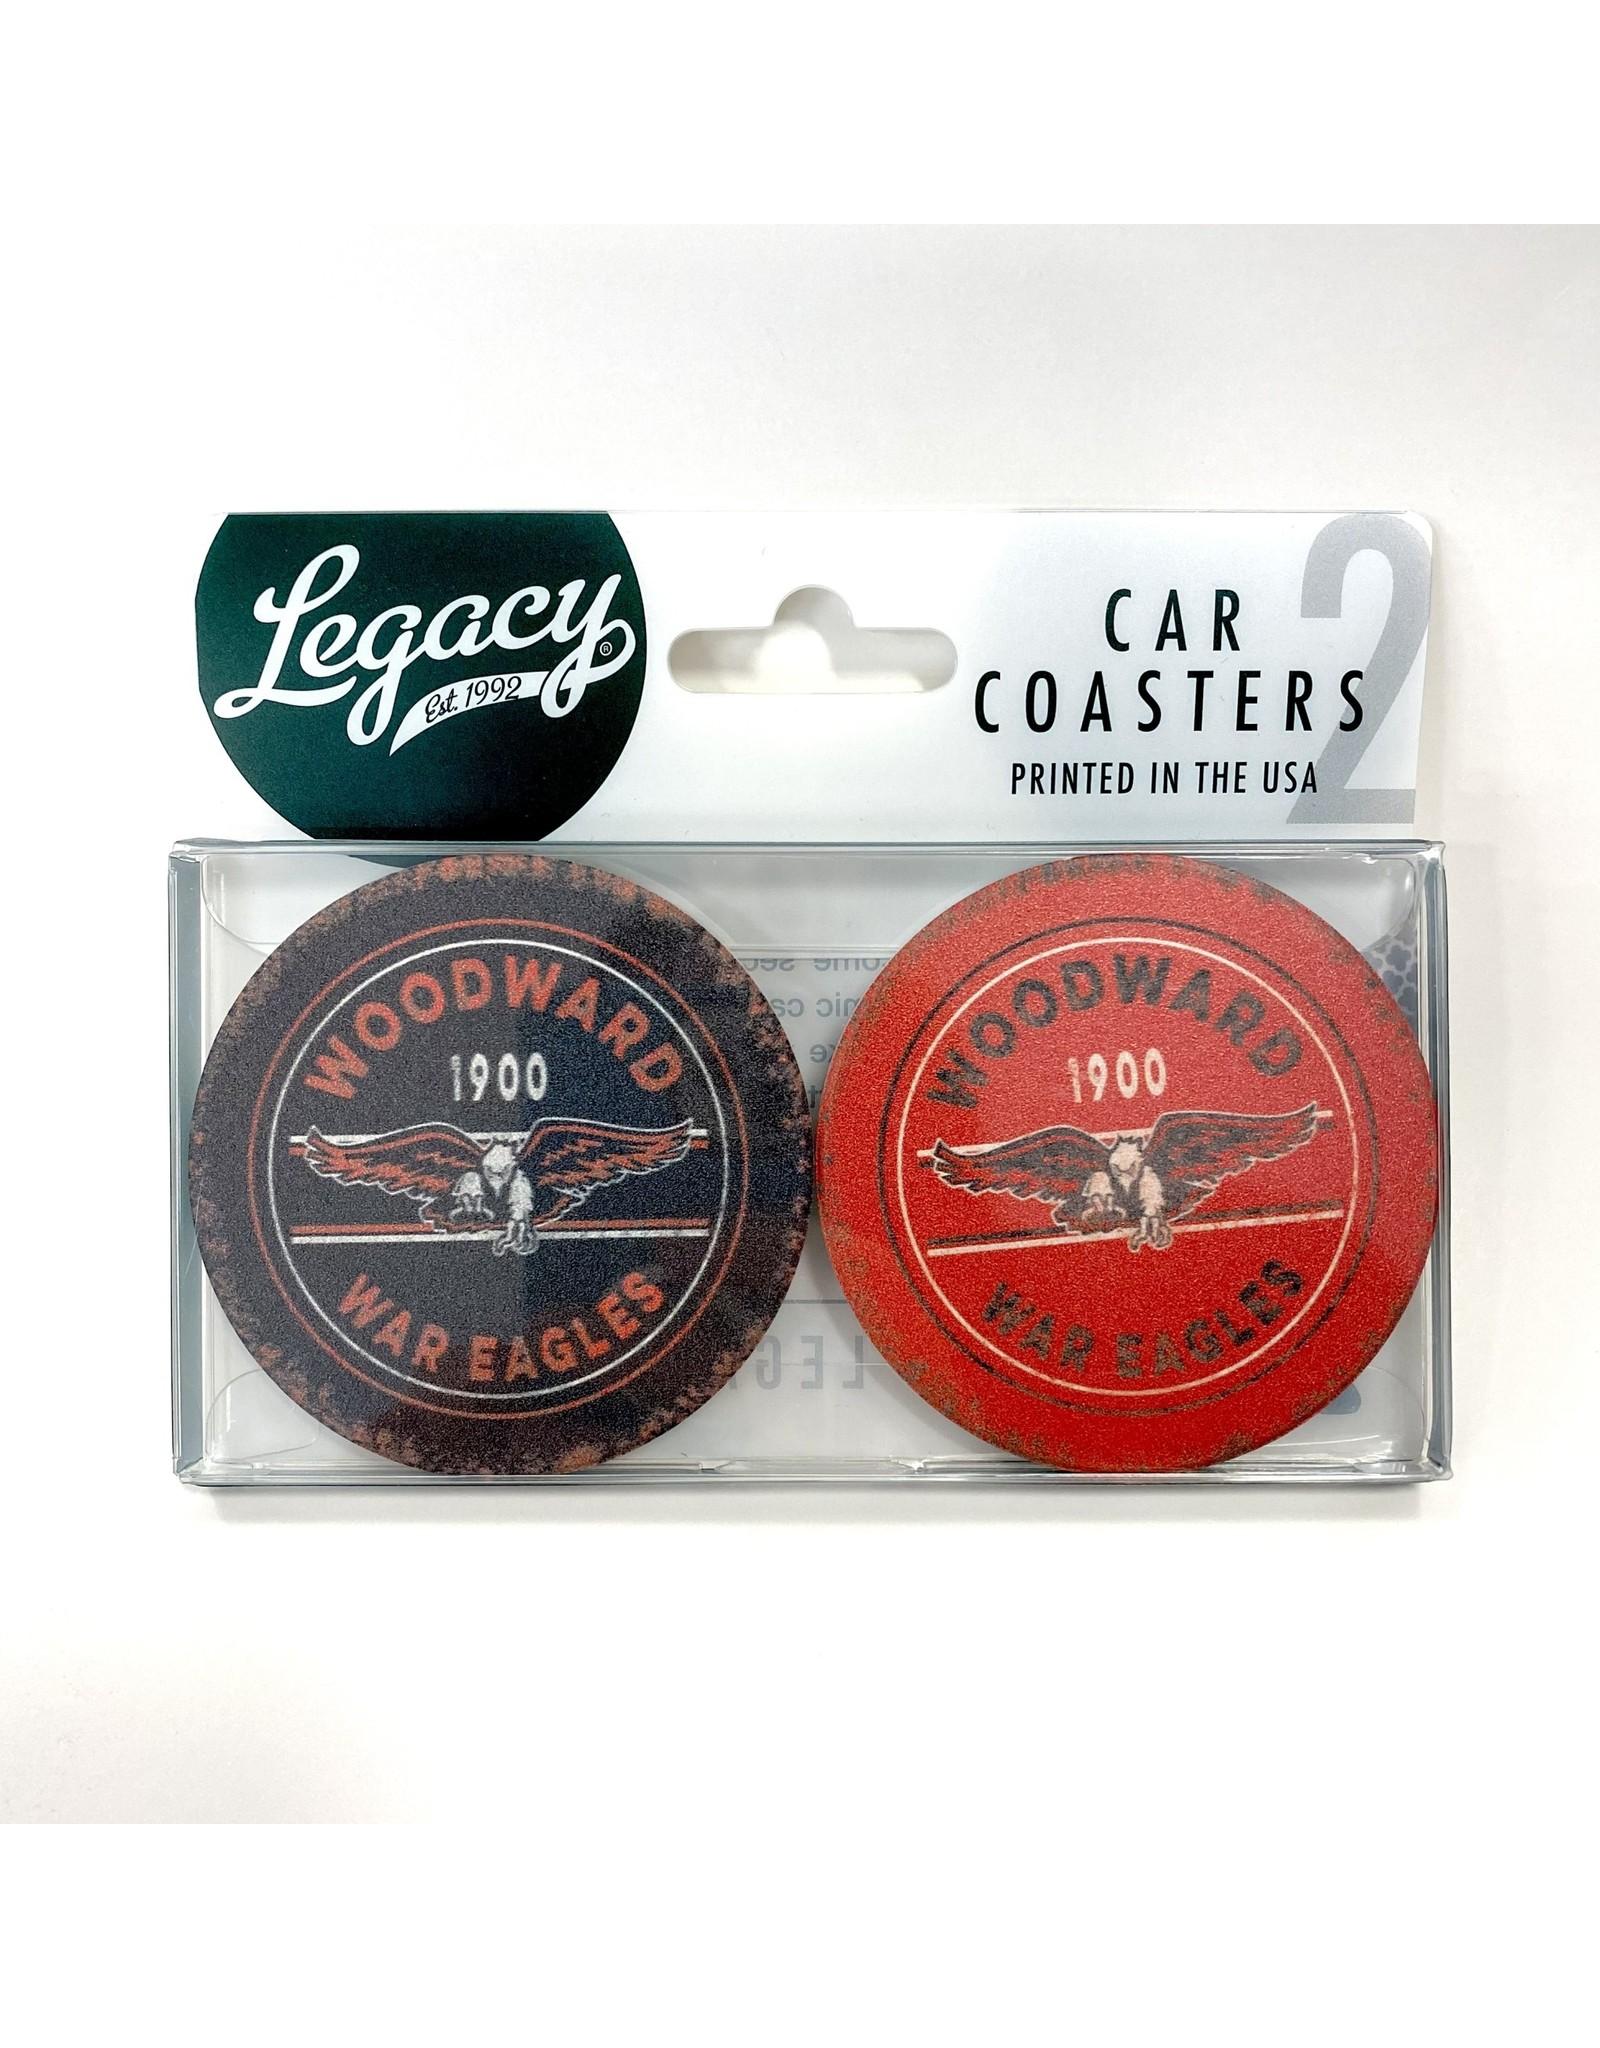 Legacy Coaster Car Set of 2 by Legacy